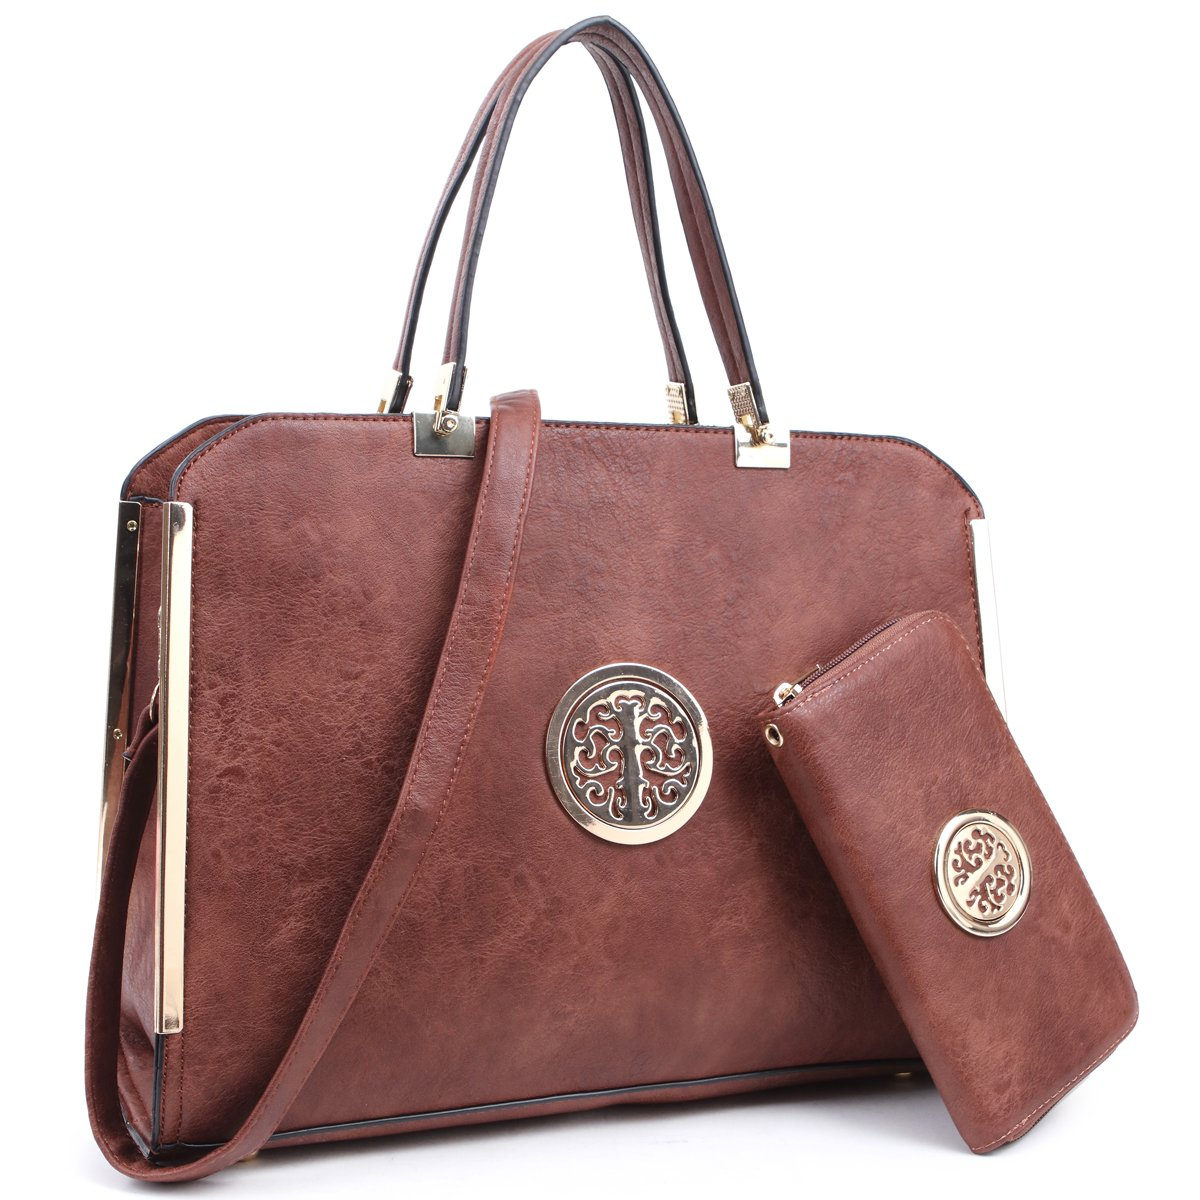 Women's Fashion Handbags Satchel Shoulder Bags Top Handle Purse with Matching Wallet(13-6900-W-CF)